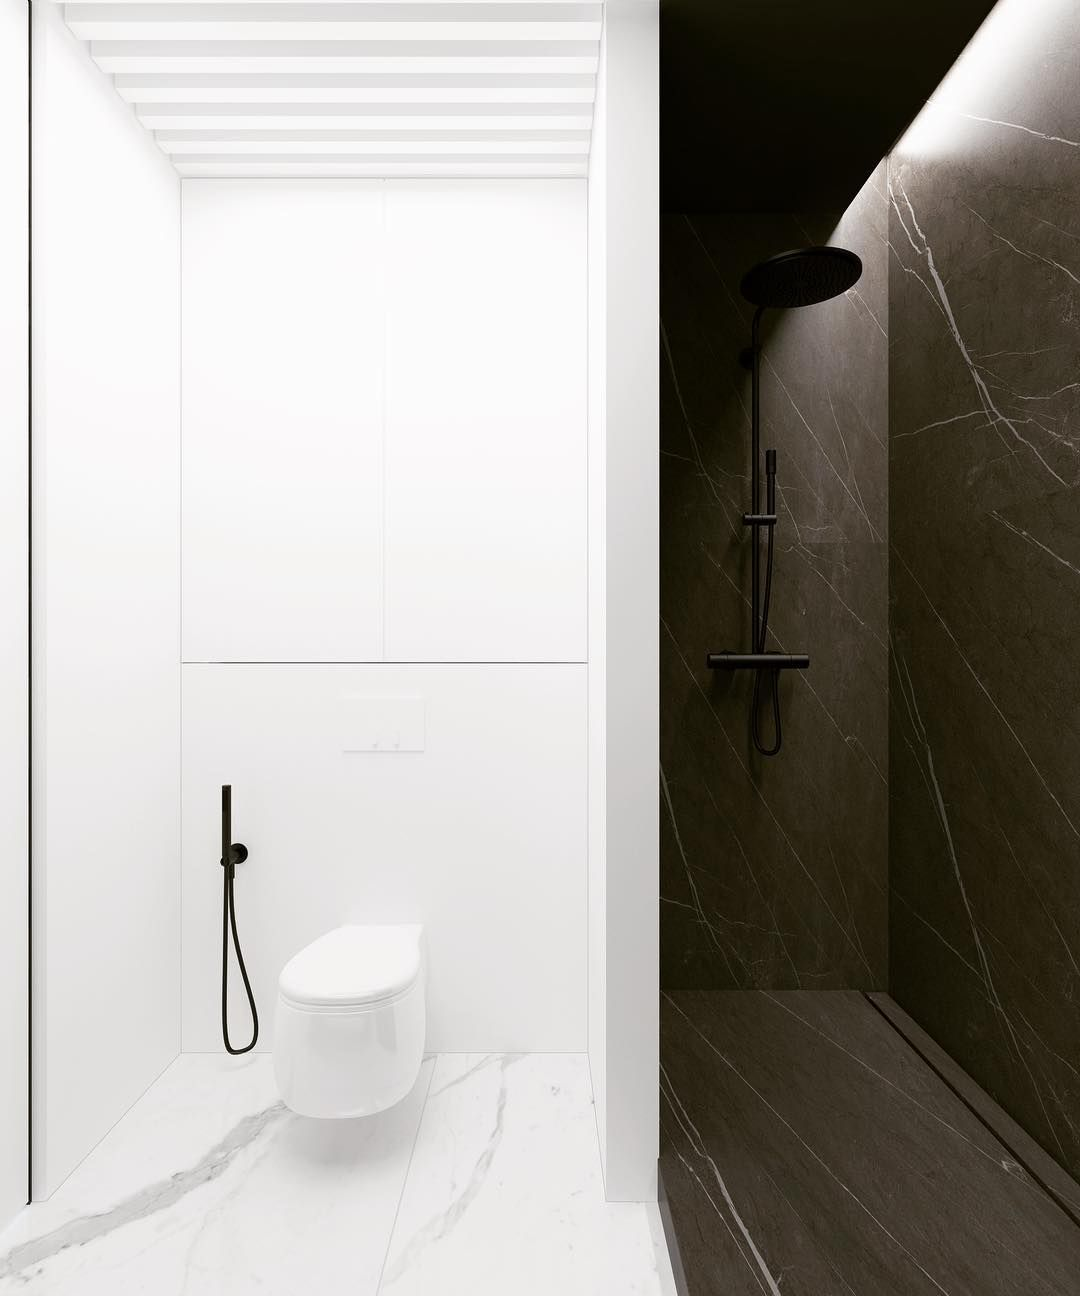 Calacatta Statuario Pietra Grey Porcelain Tile Marble Look